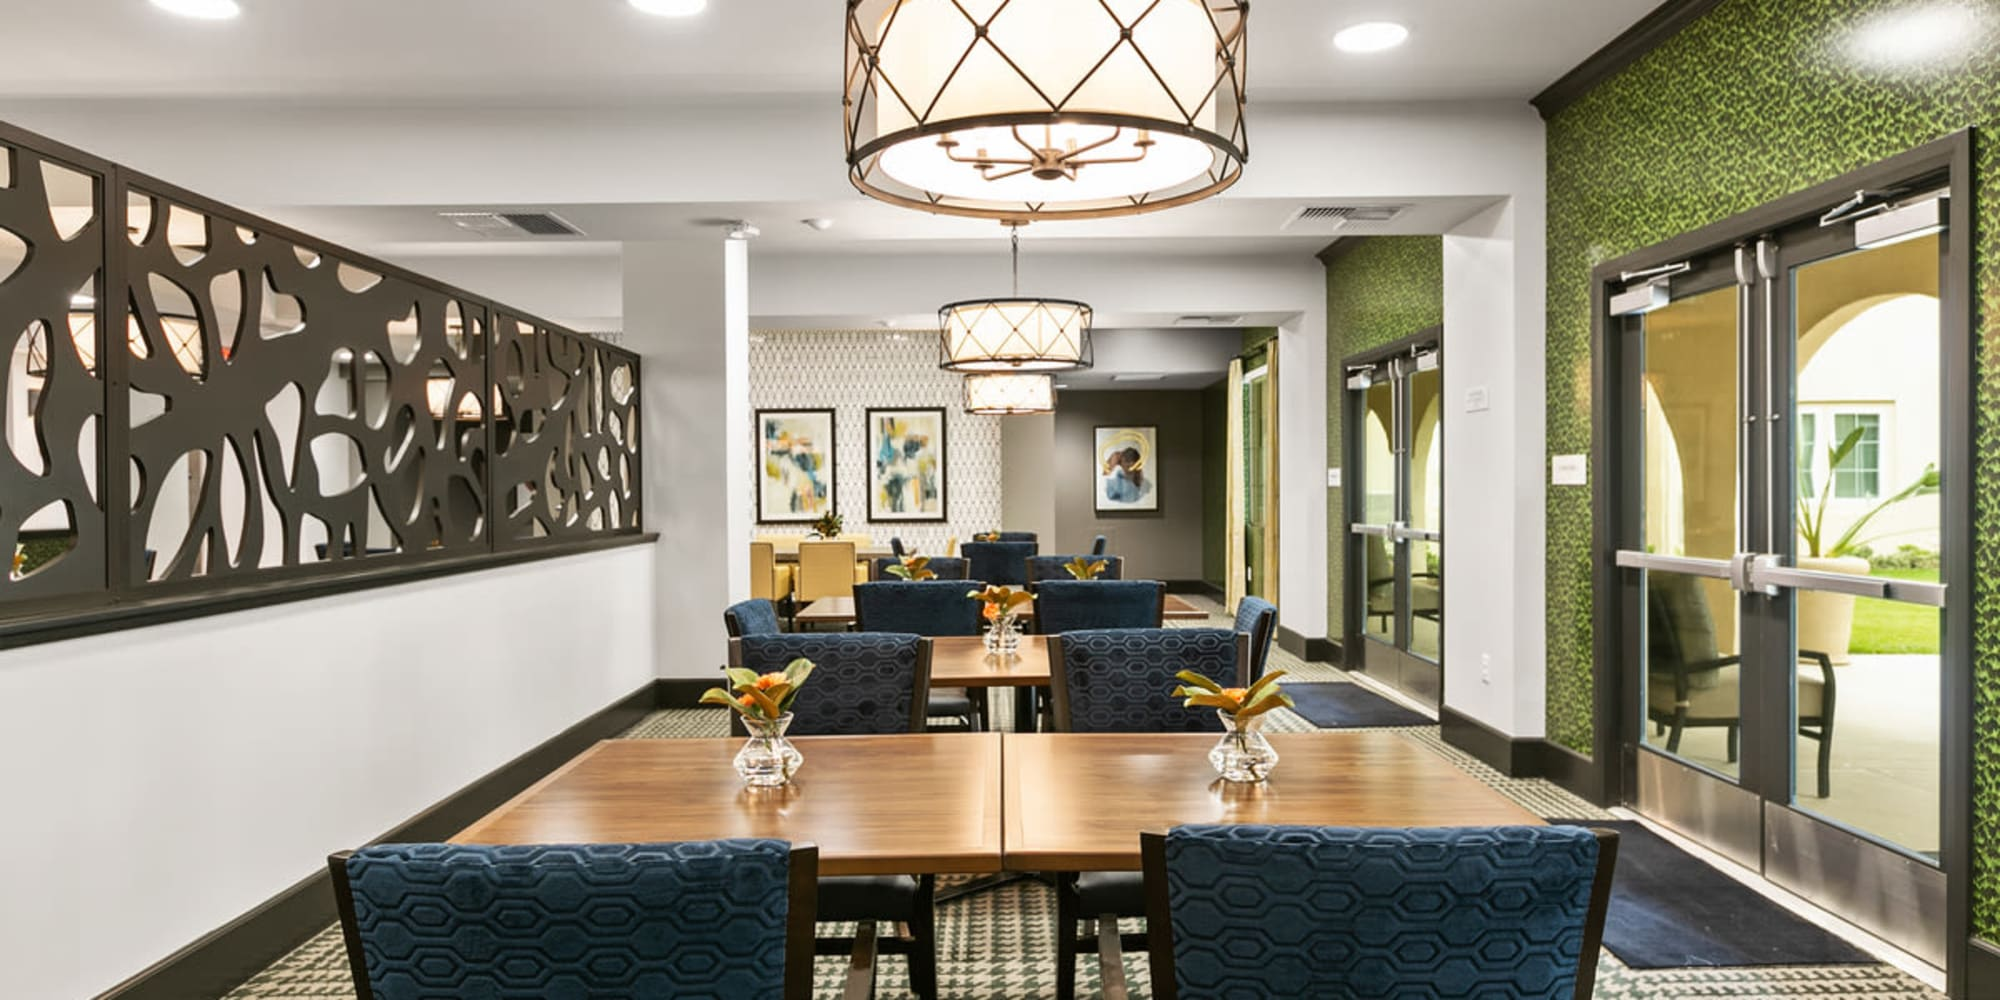 Senior living in Fallbrook, California at Estancia Senior Living Dining Area